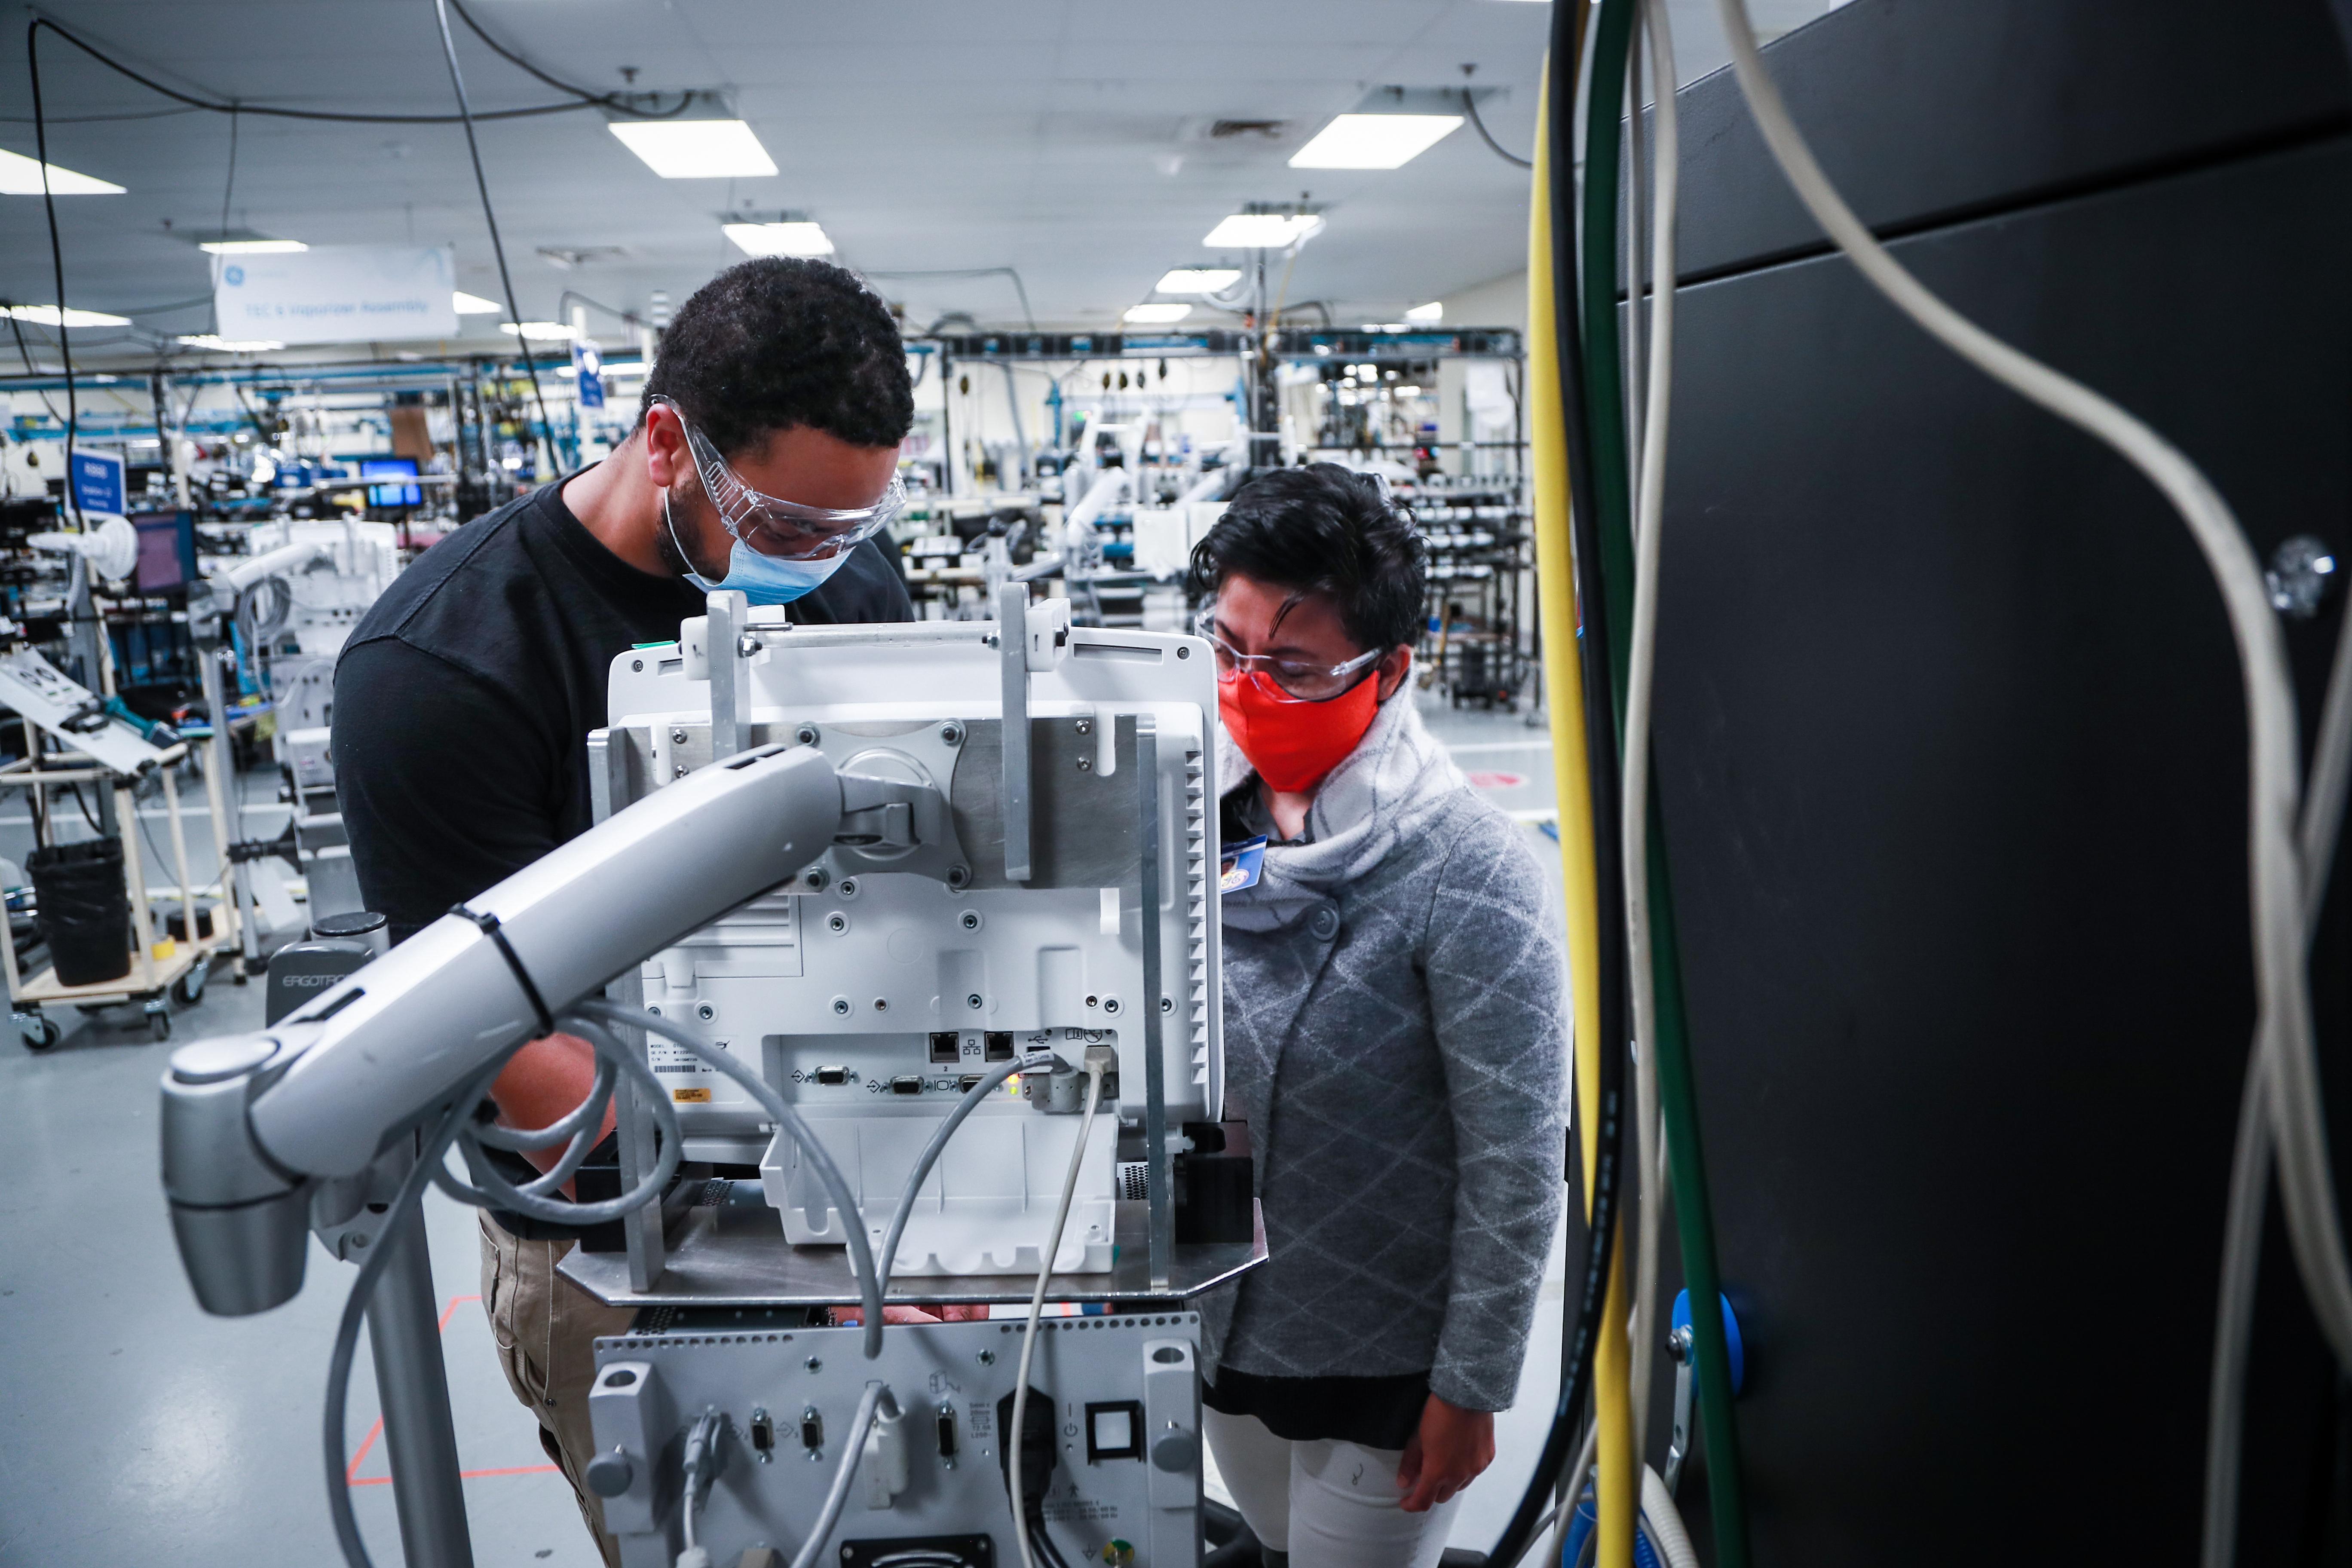 R860 Ventilator Testing at Madison.jpg